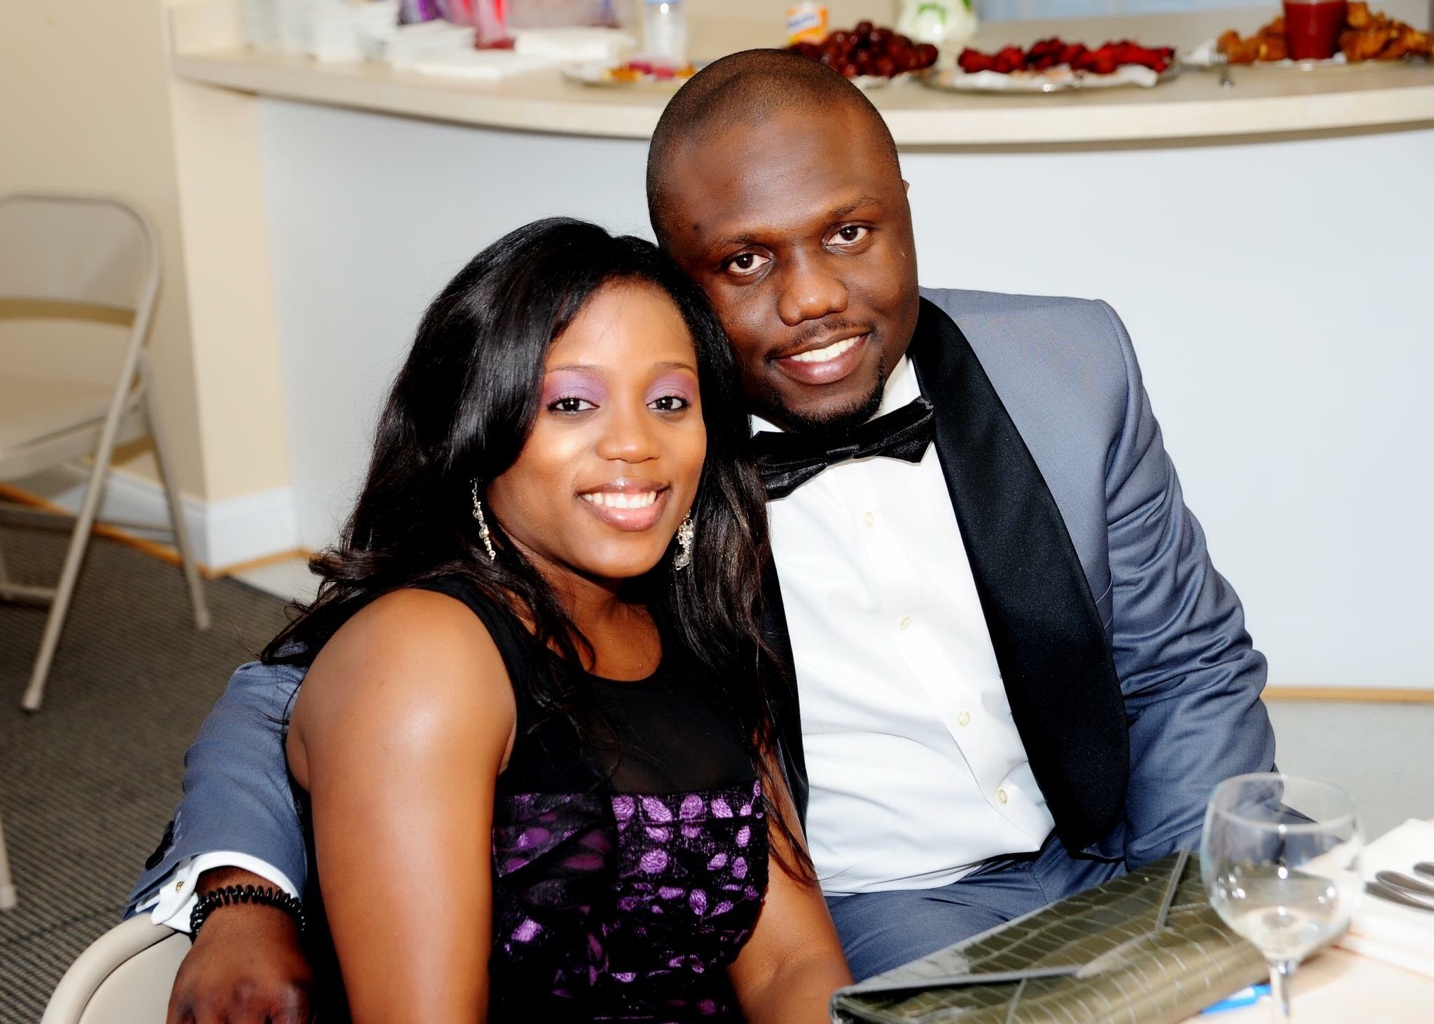 Happy Wedding Anniversary To the